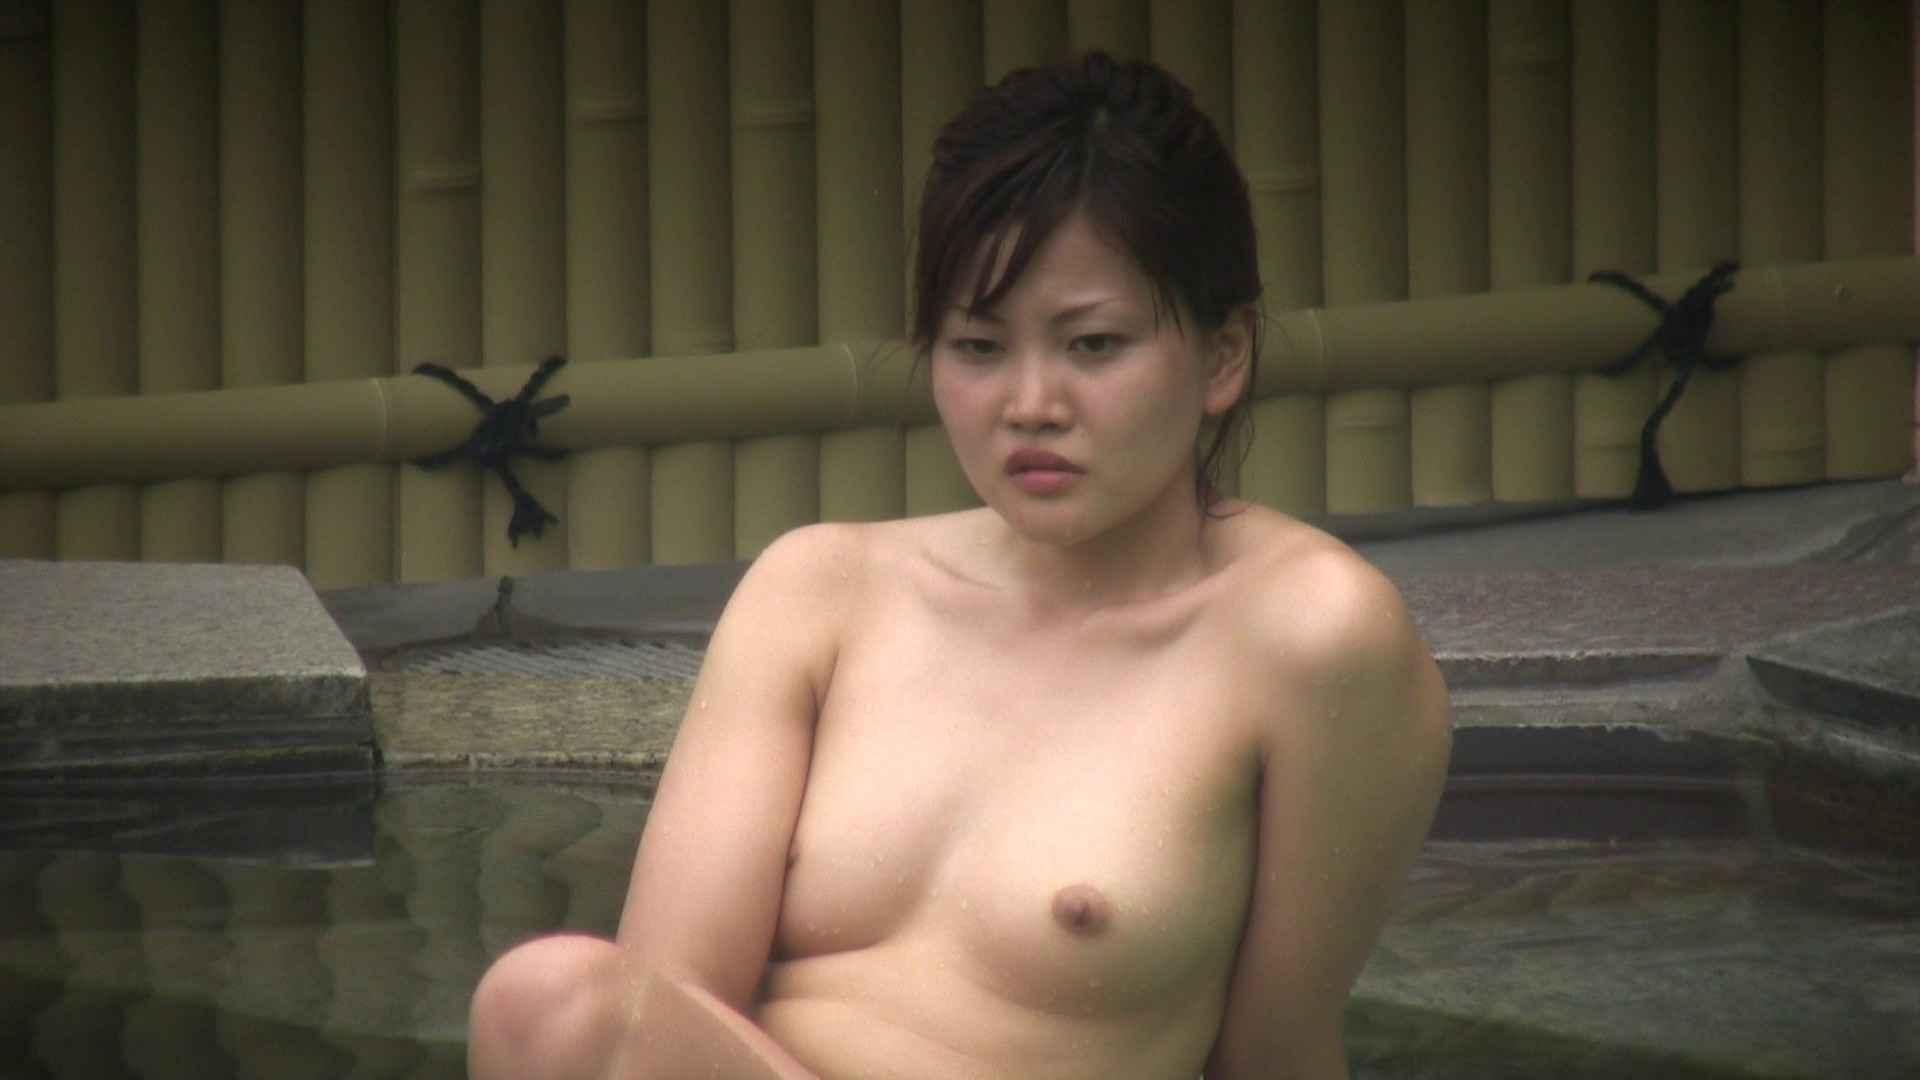 Aquaな露天風呂Vol.125 露天  88連発 76